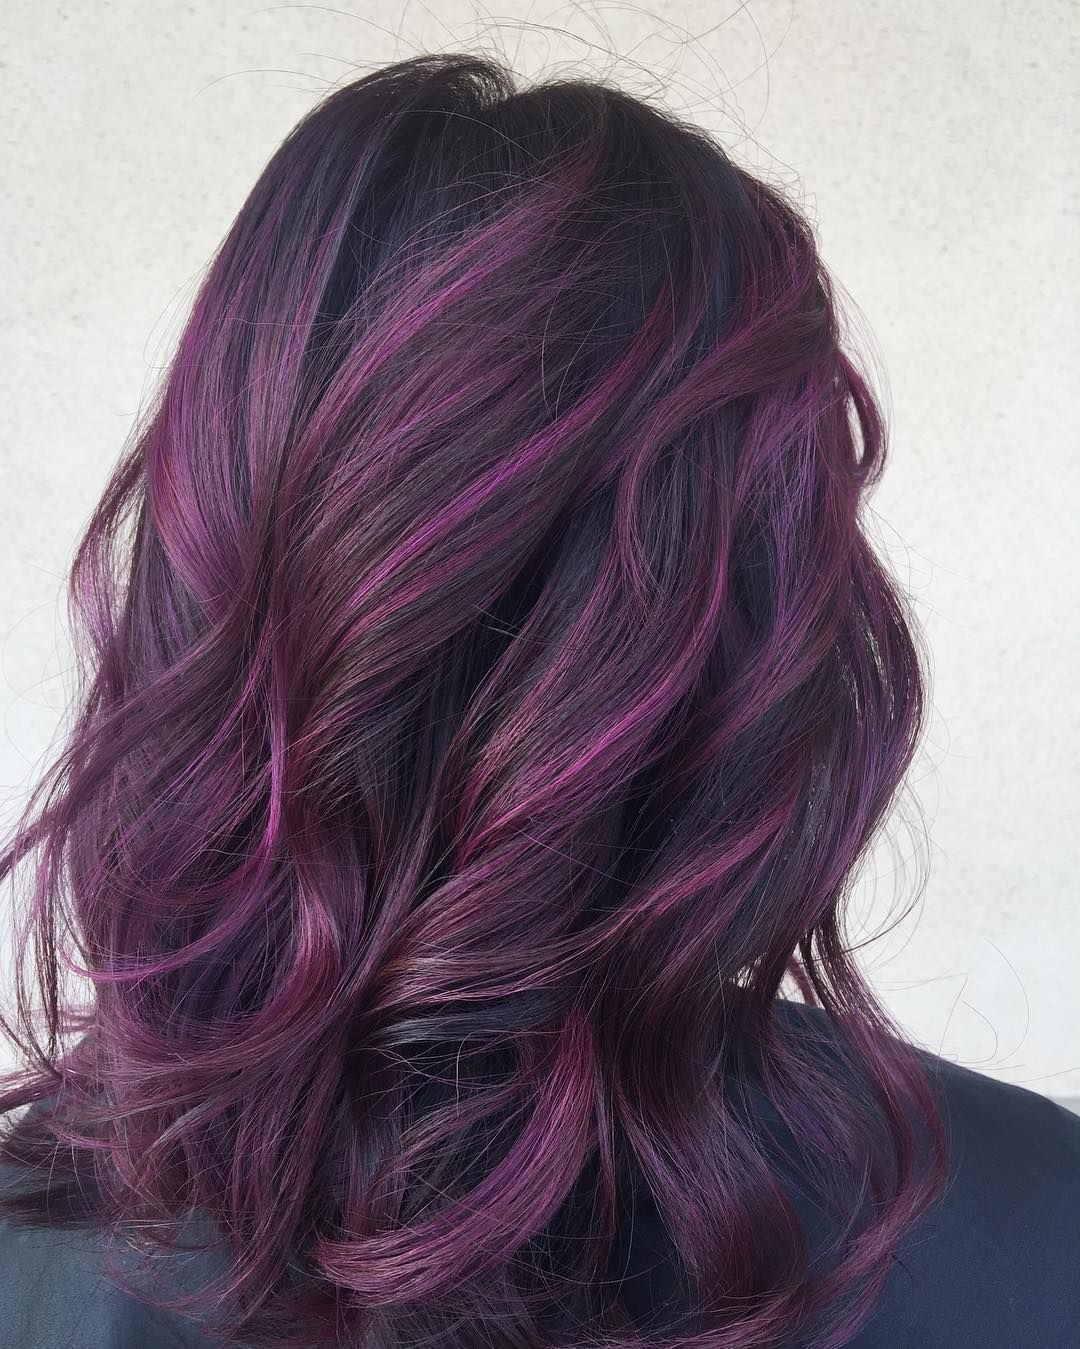 black and purple hair styles